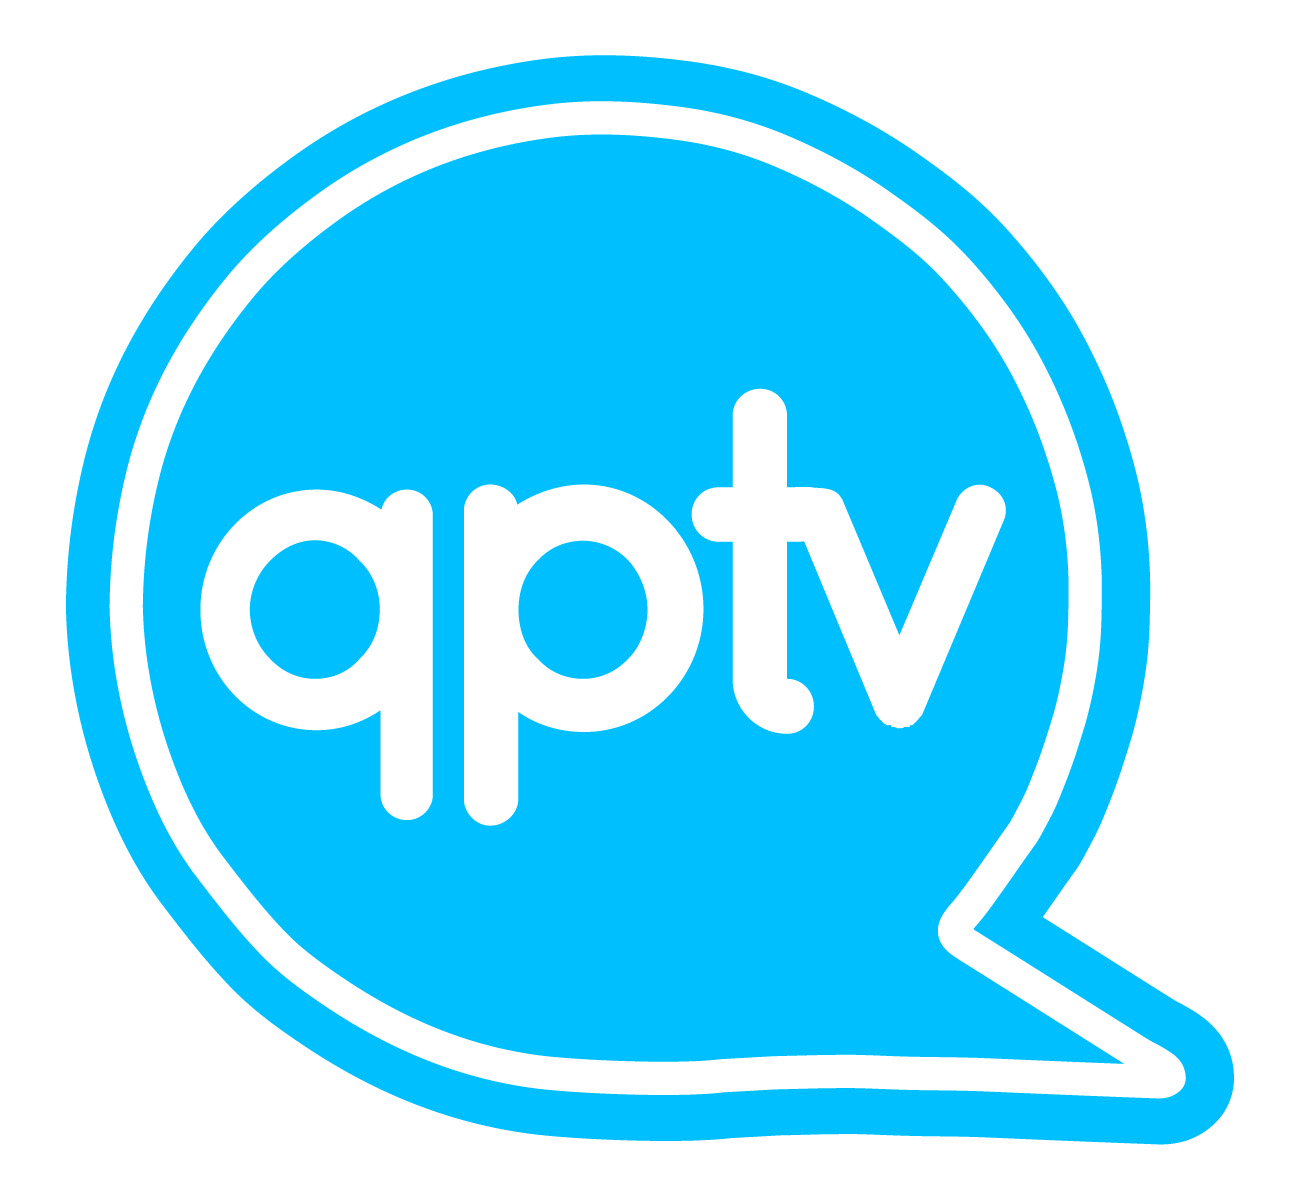 Art for - COVID-19 Episode 1: Understanding the Virus by QPTV Radio